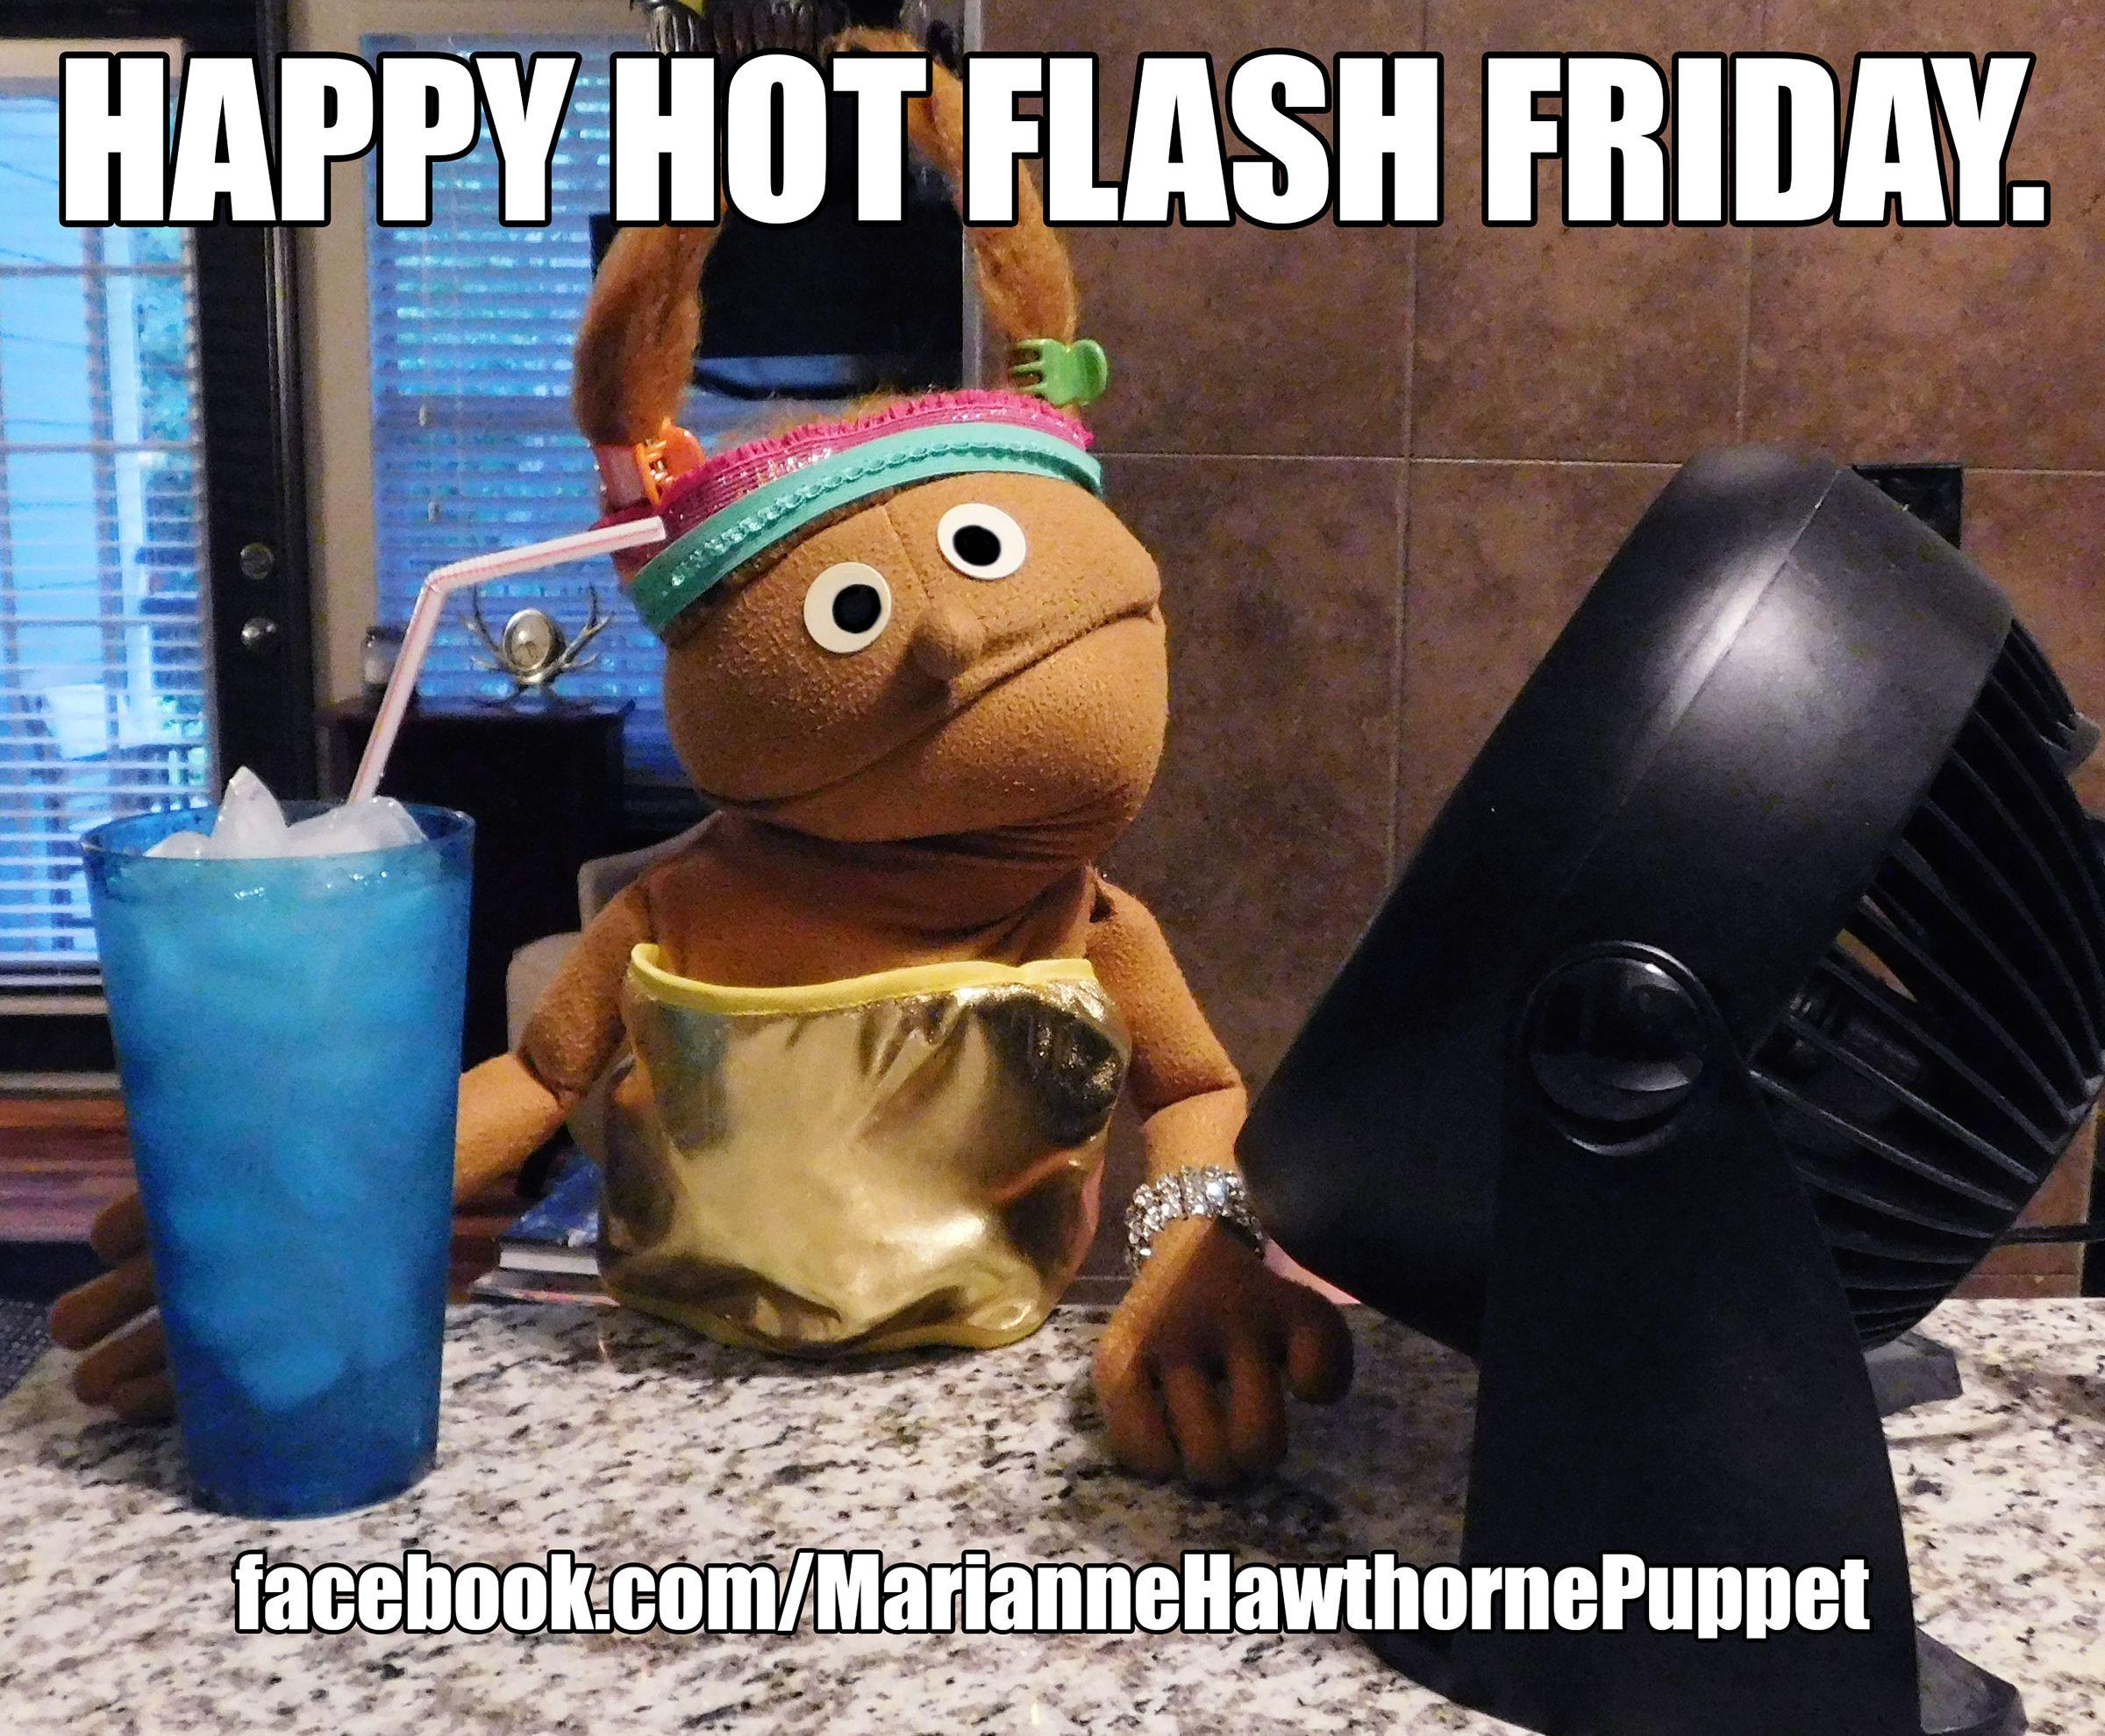 Hot Flash Meme Happy Hot Flash Friday Meme Women Comedy